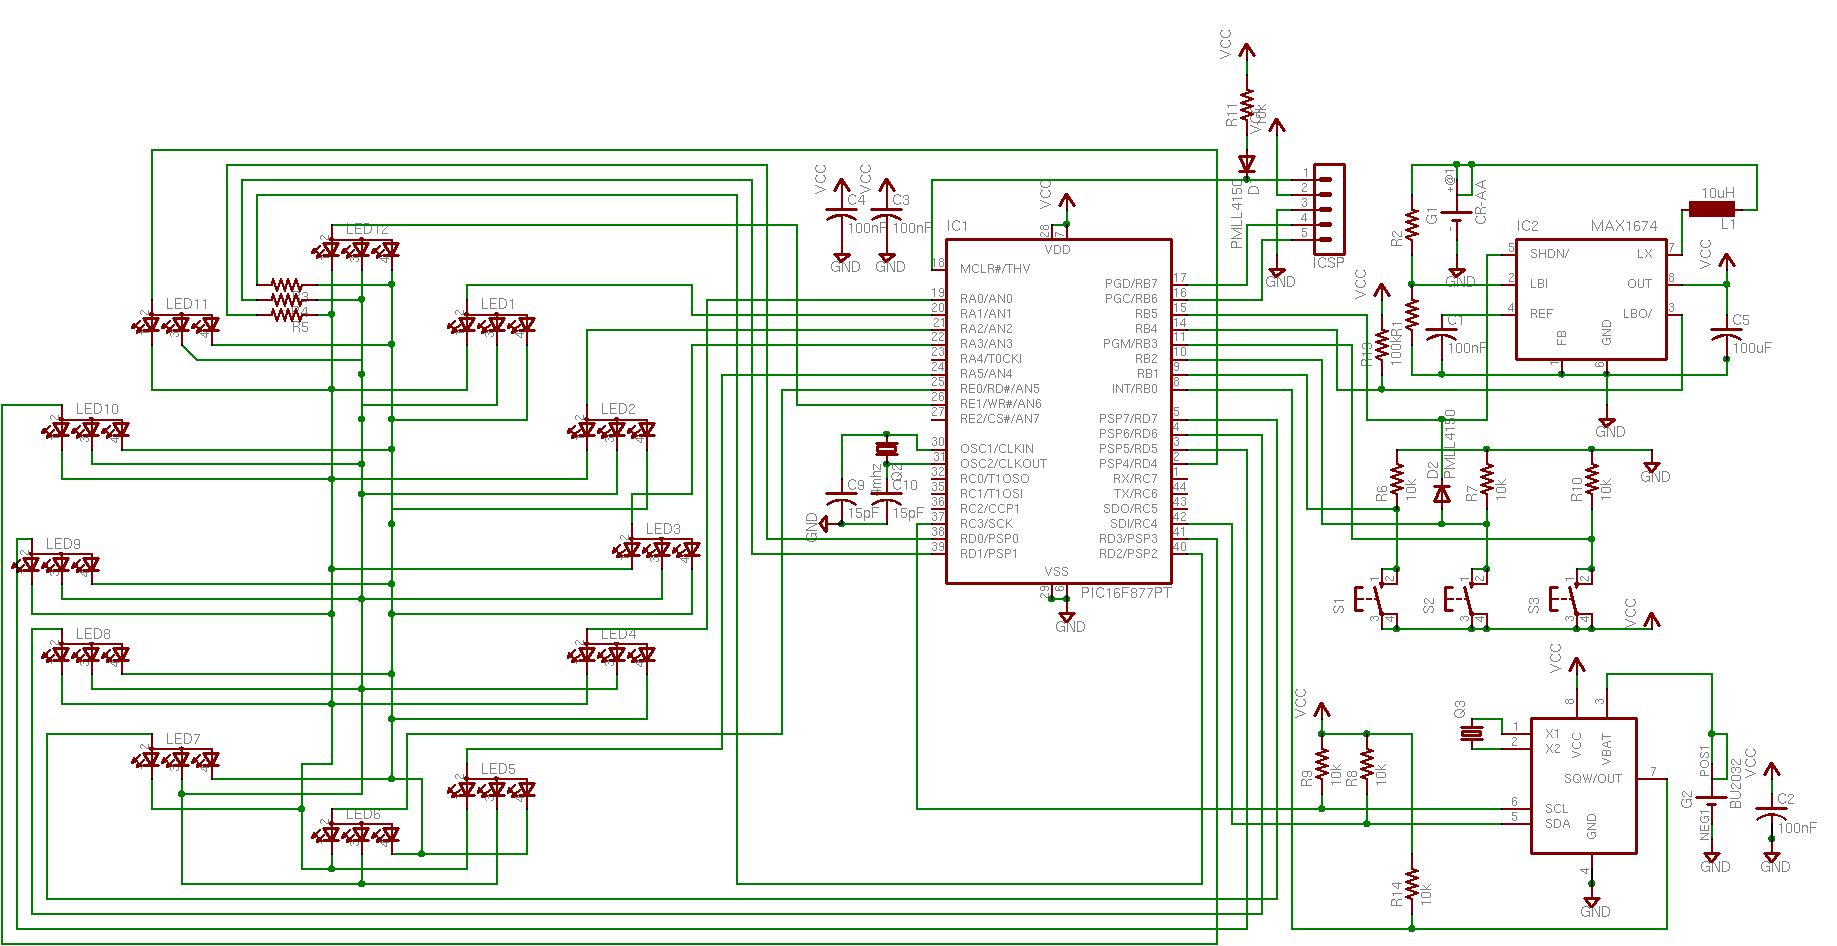 blake's conflabatorium digital clock ii electronic drawing software 12 Volt LED Tail Lights Diagram  7 Segment Display Wiring Diagram Light Controller Wiring Diagram Tir3 Wiring Diagram